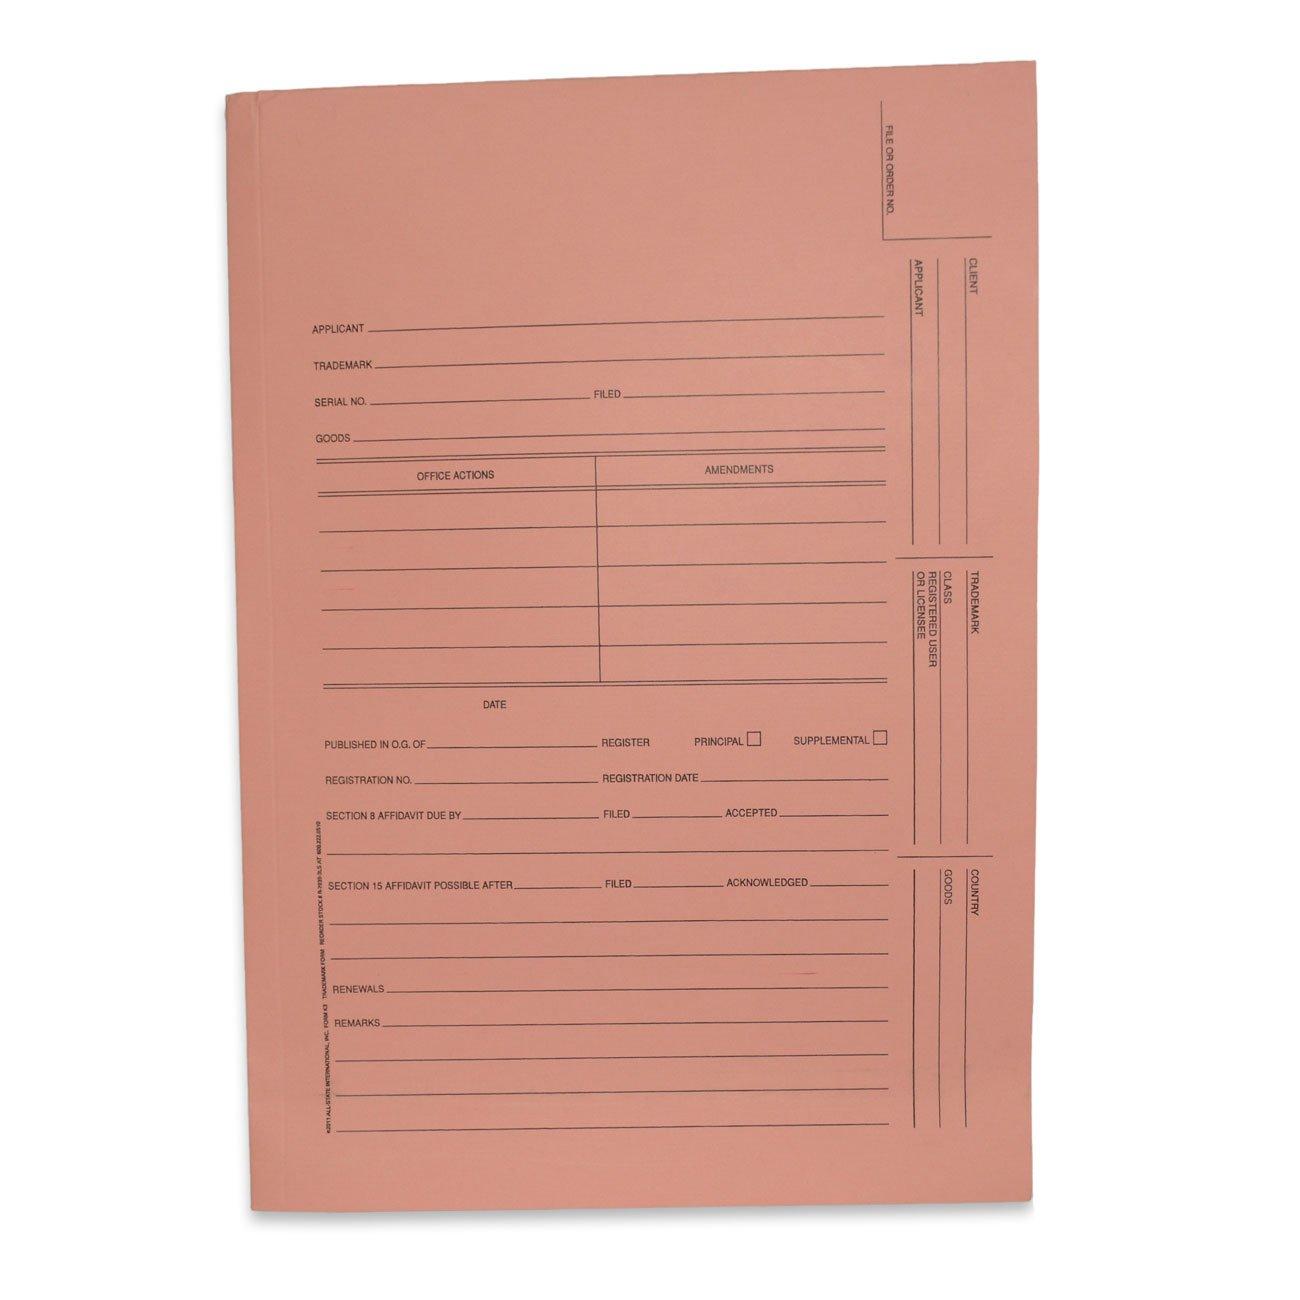 Kruysman/Redweld Trademark Folder, 3 Panel, 10 1/4'' x 14 1/2'' When Folded, Salmon, 100 per Box